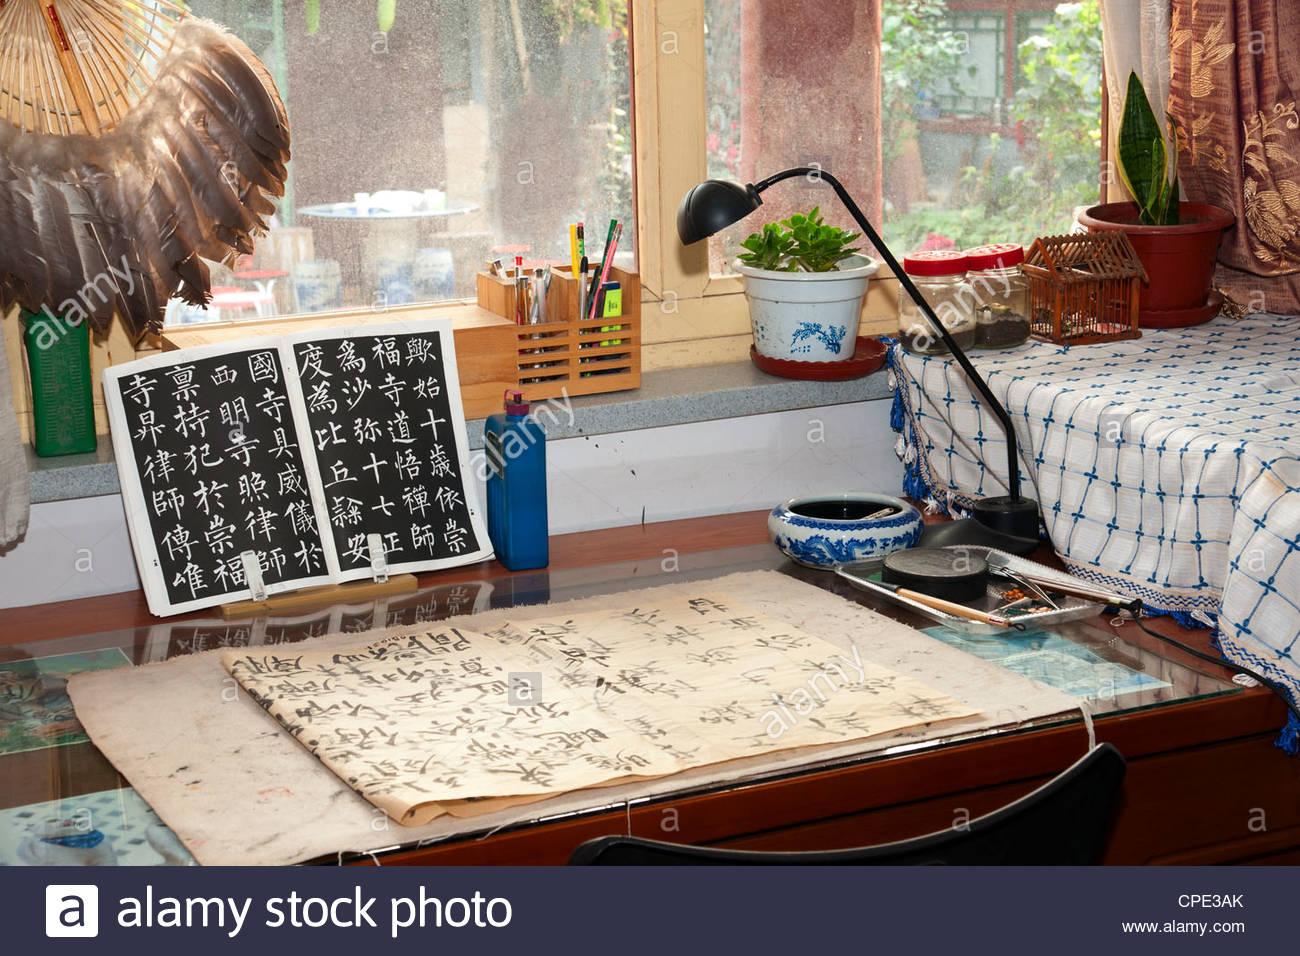 Calligraphy artist's desk, Xiaojinsi Hutong district, Beijing, China, Asia - Stock Image